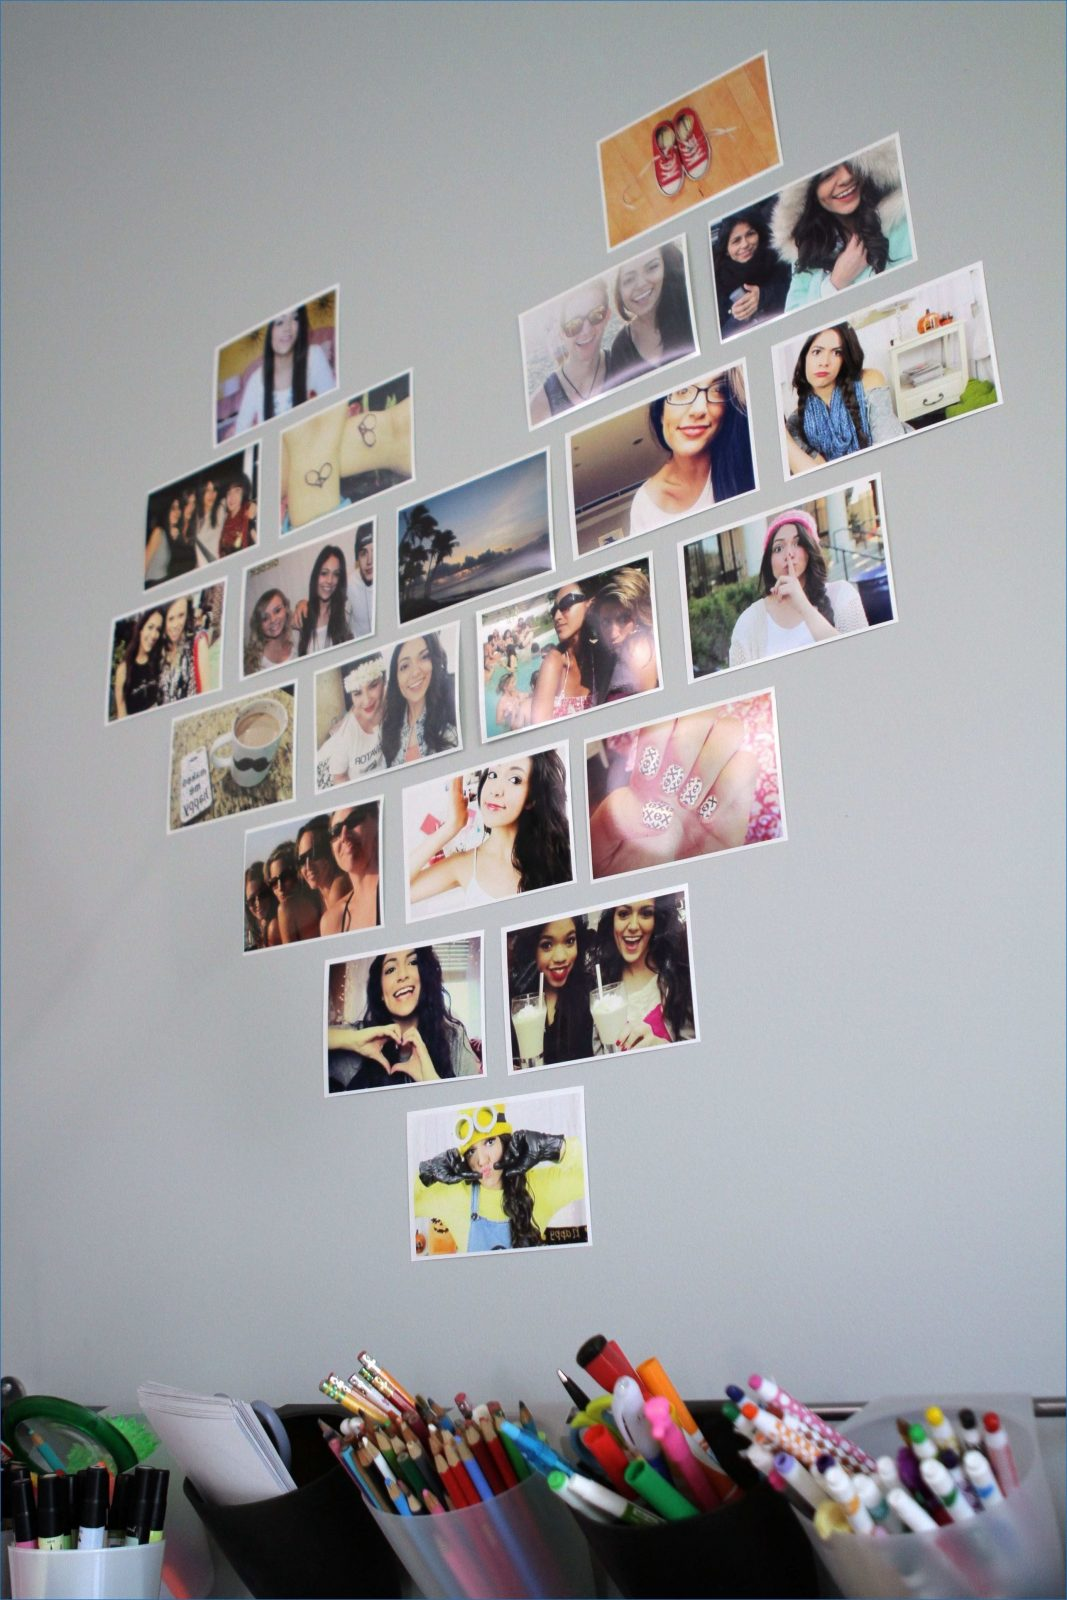 Leinwand Fotocollage Awesome Fotocollage Auf Leinwand Selber von Leinwand Collagen Selbst Gestalten Bild